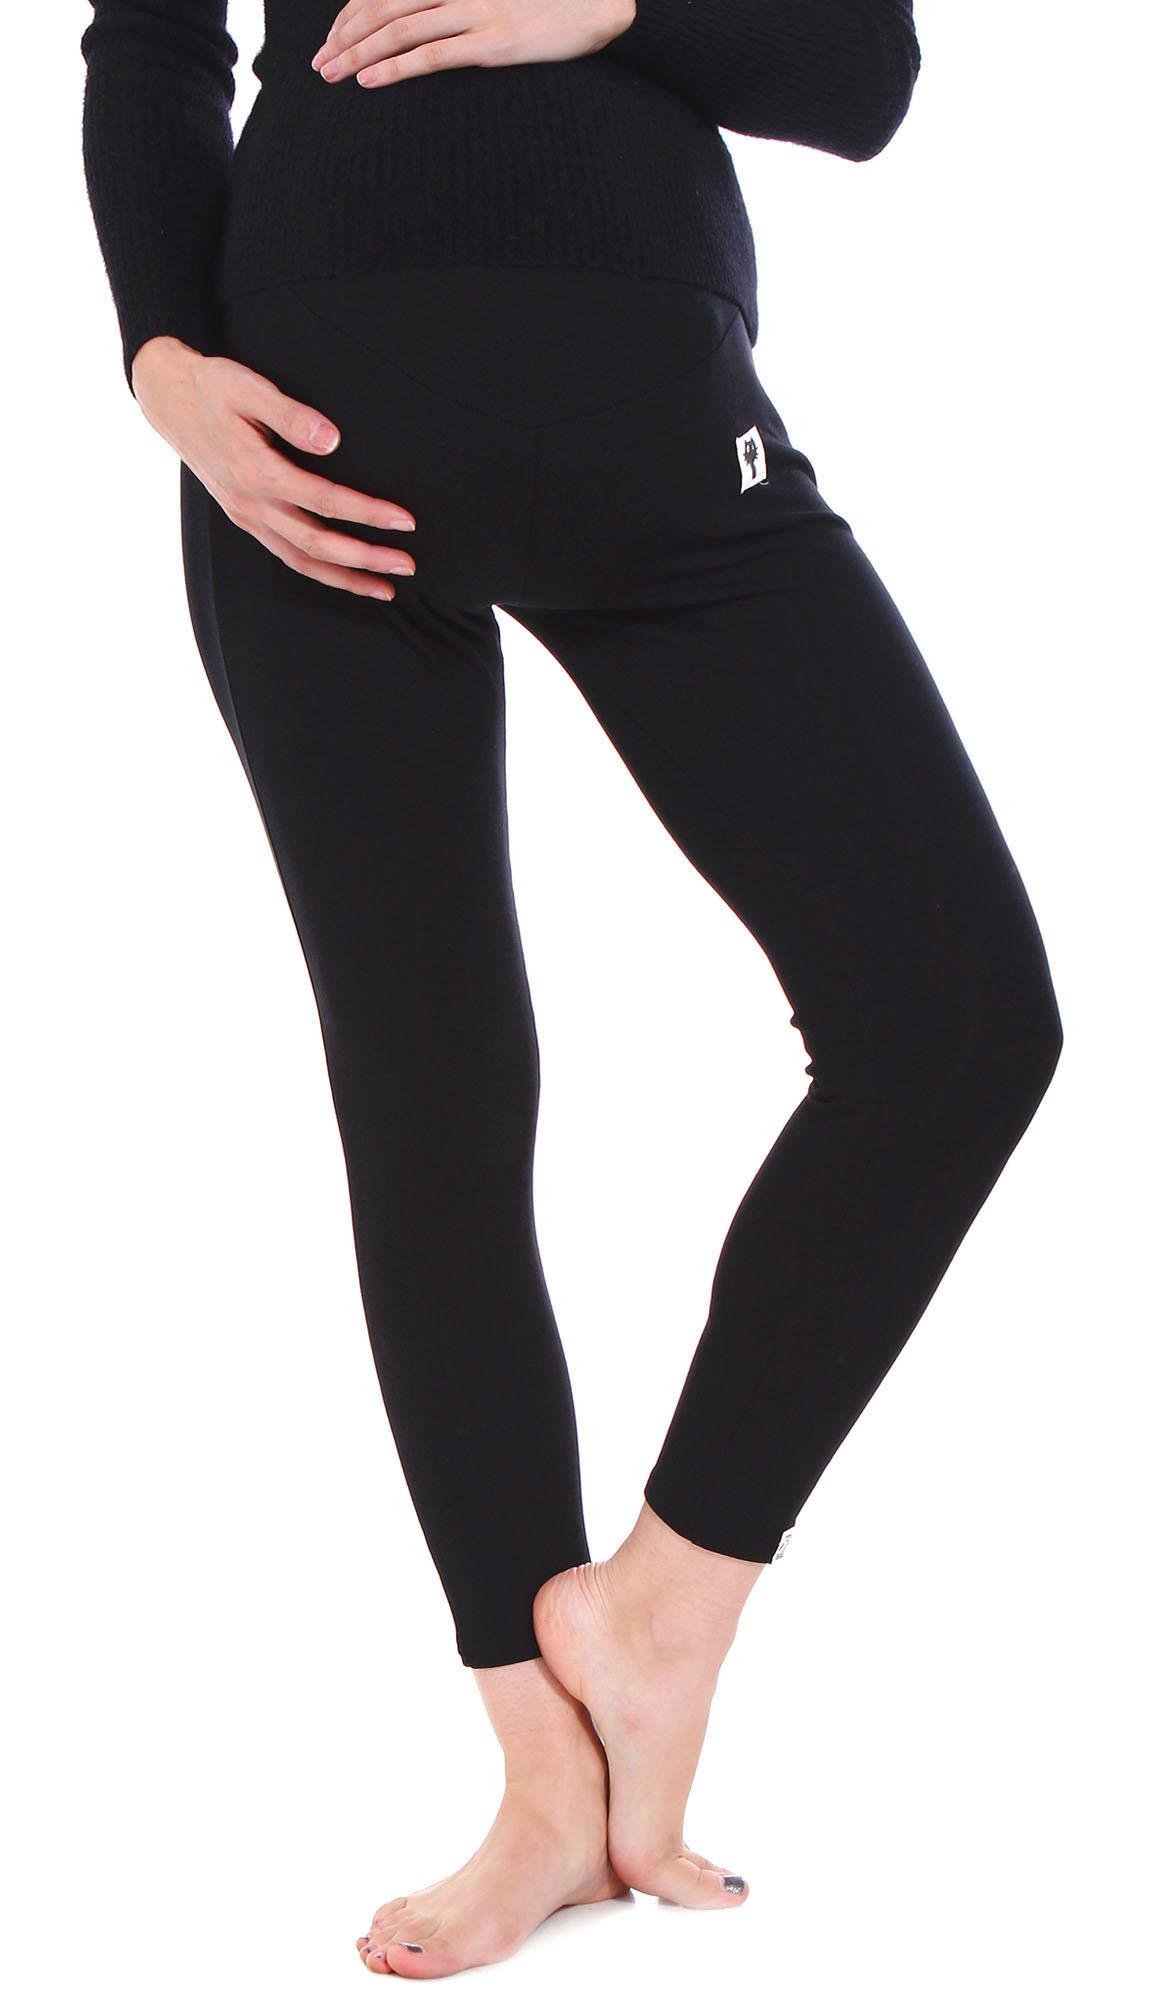 Fit Stretch Over Bump Maternity Pregnancy Leggings, 3025_Black